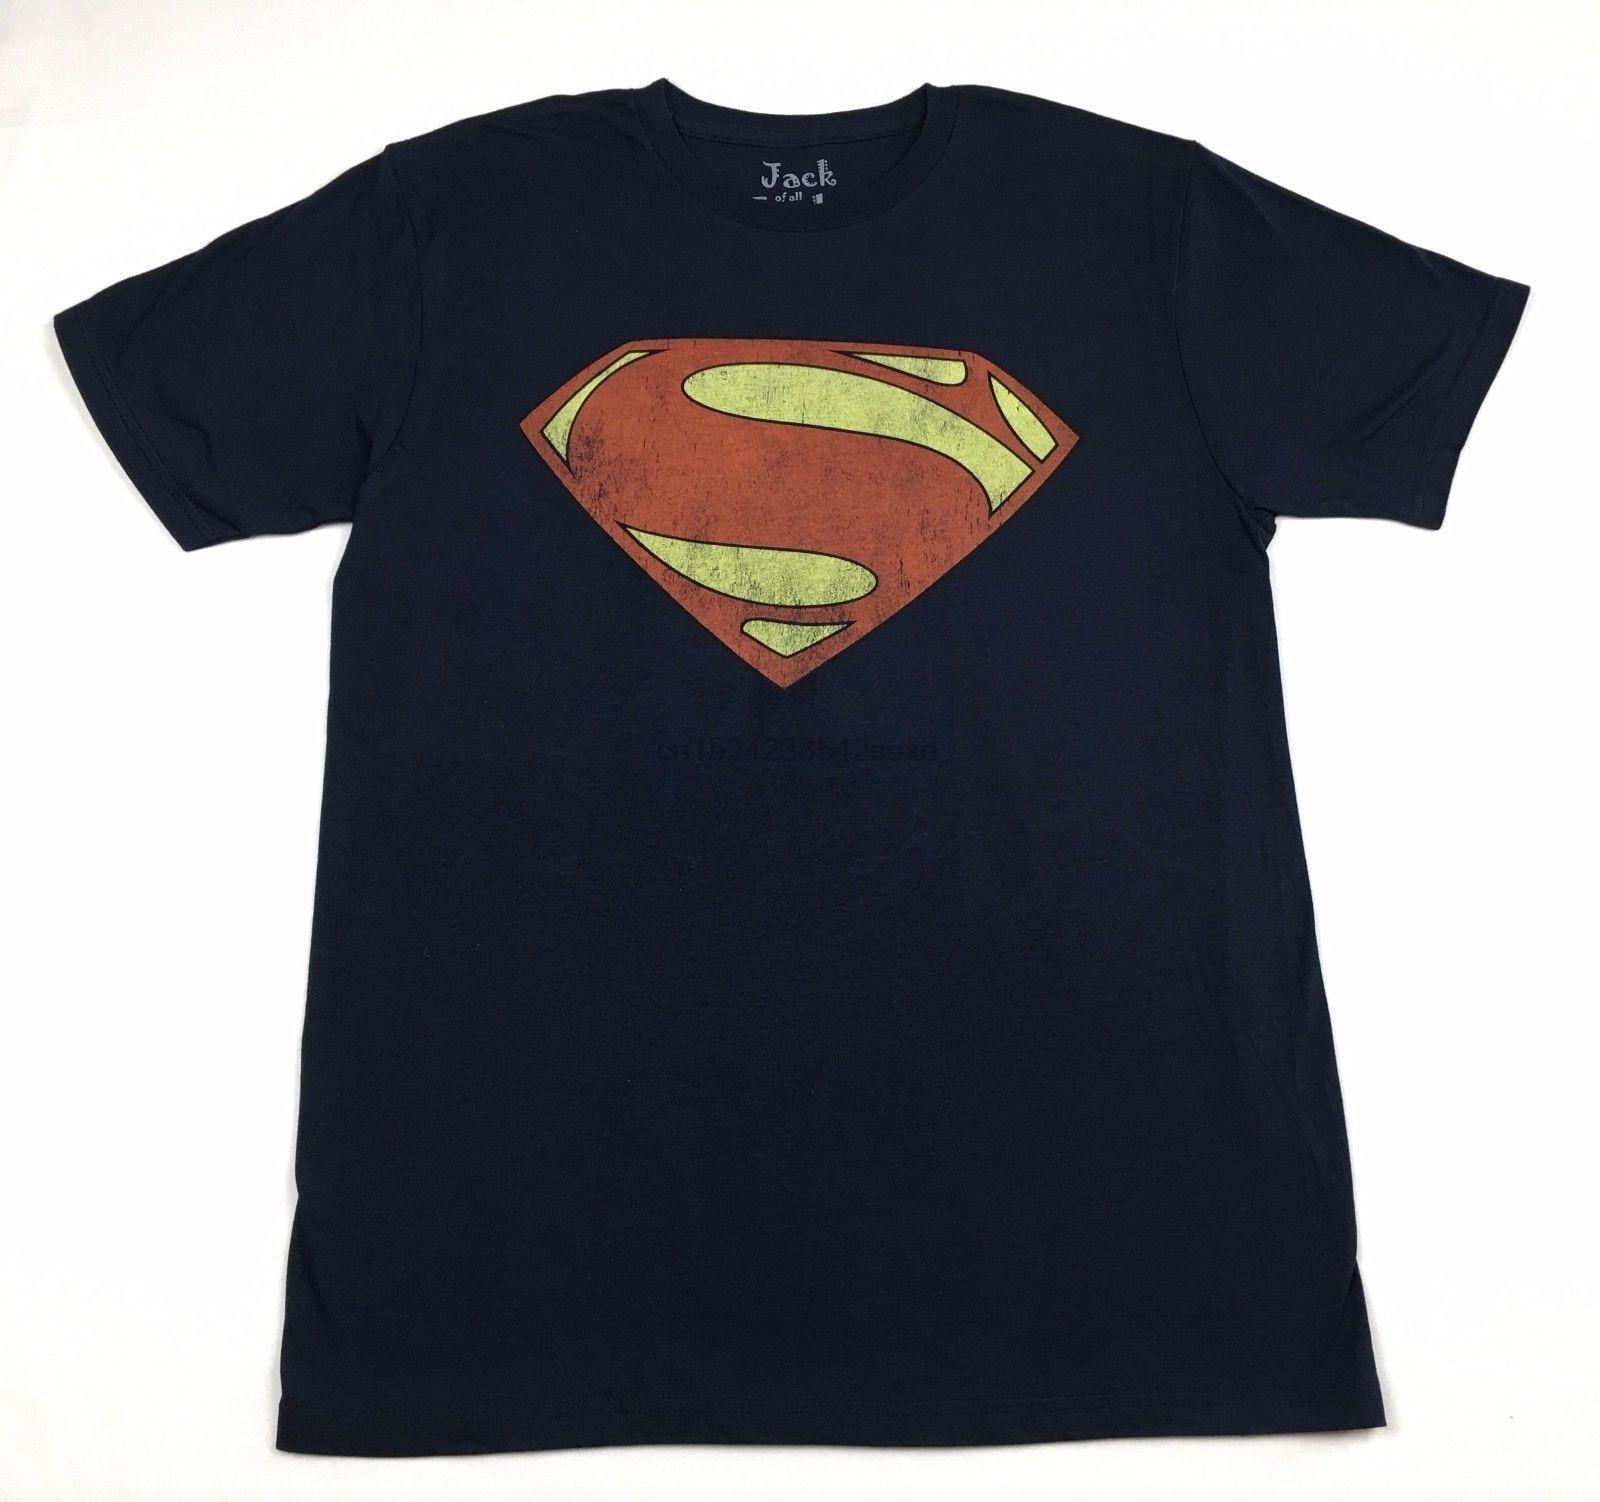 DC COMICS RUN FLASH RUN Licensed Boys Graphic Tee Shirt 2T 3T 4T 4 5-6 7